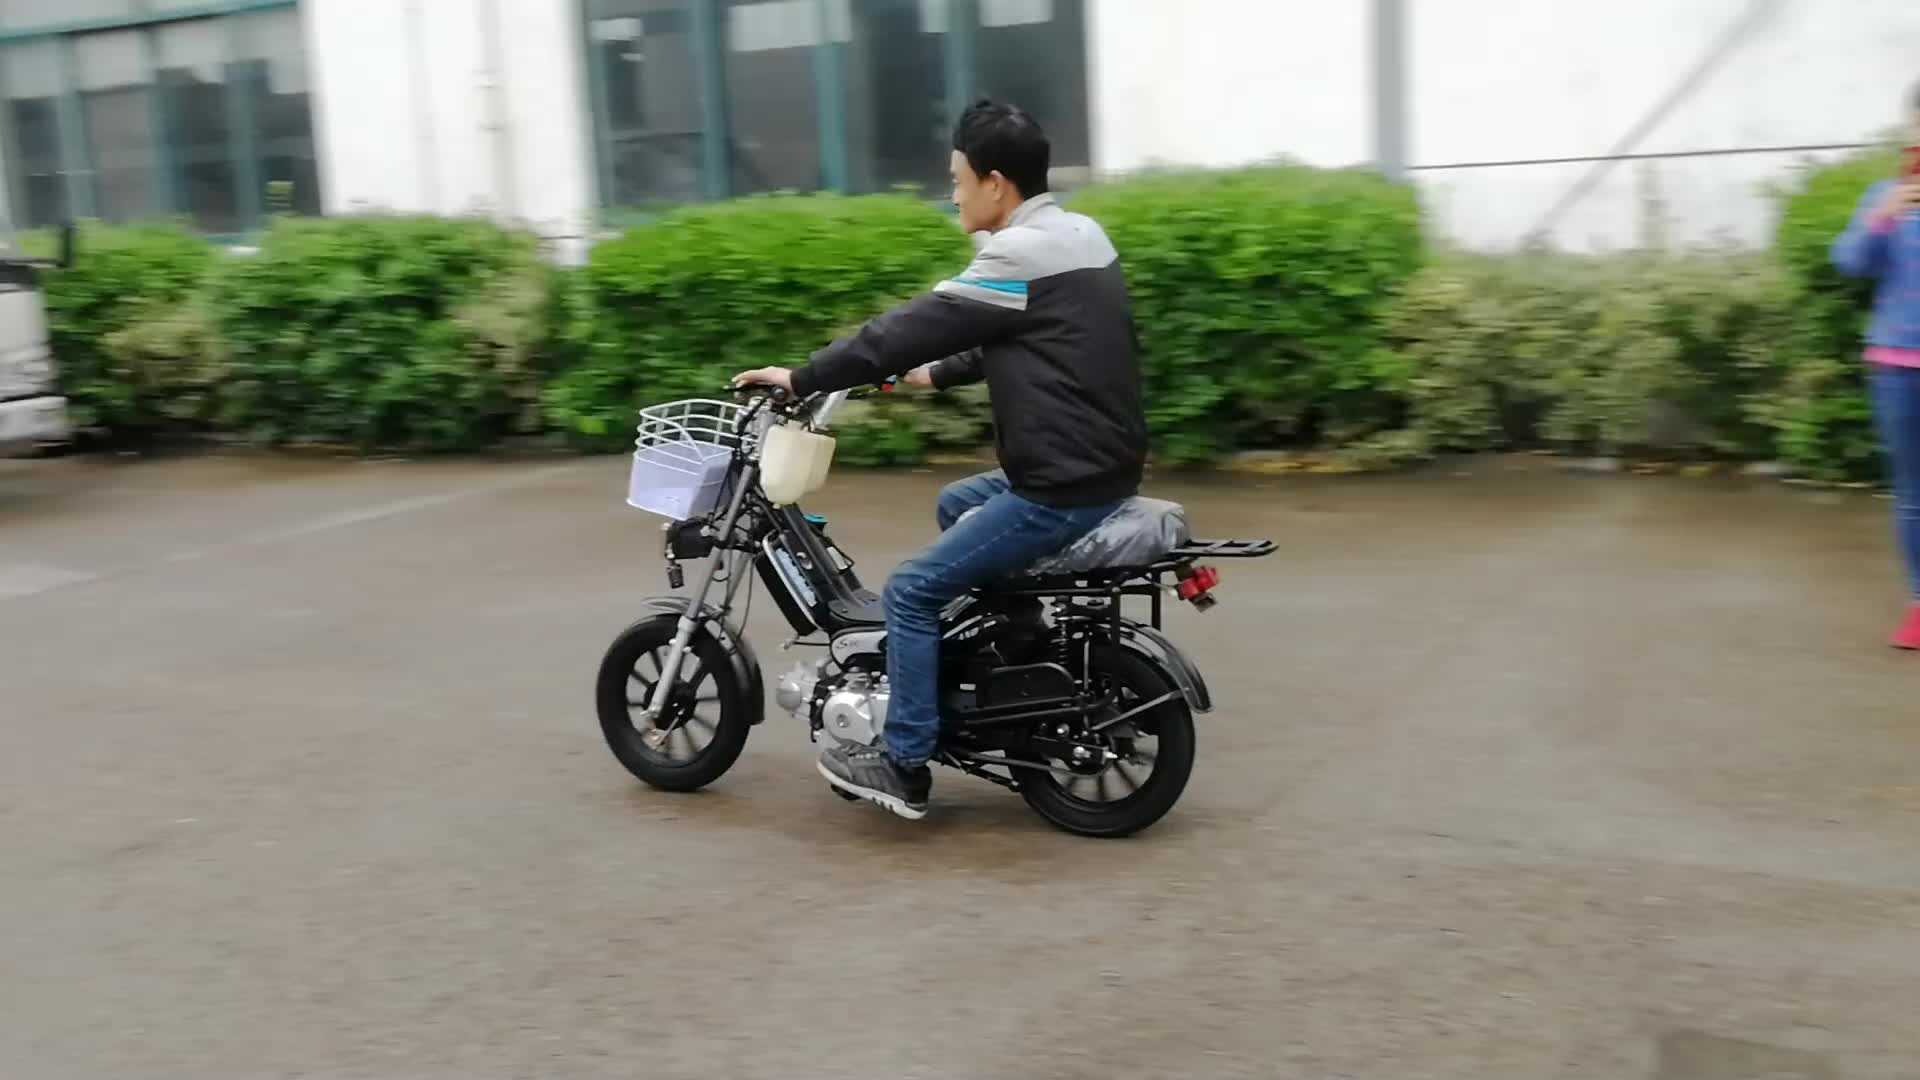 Chino motocicleta de 4 tiempos moskito gasolina mini 110cc 49cc 70cc 50 cc 50cc motocicleta ciclomotor con pedales